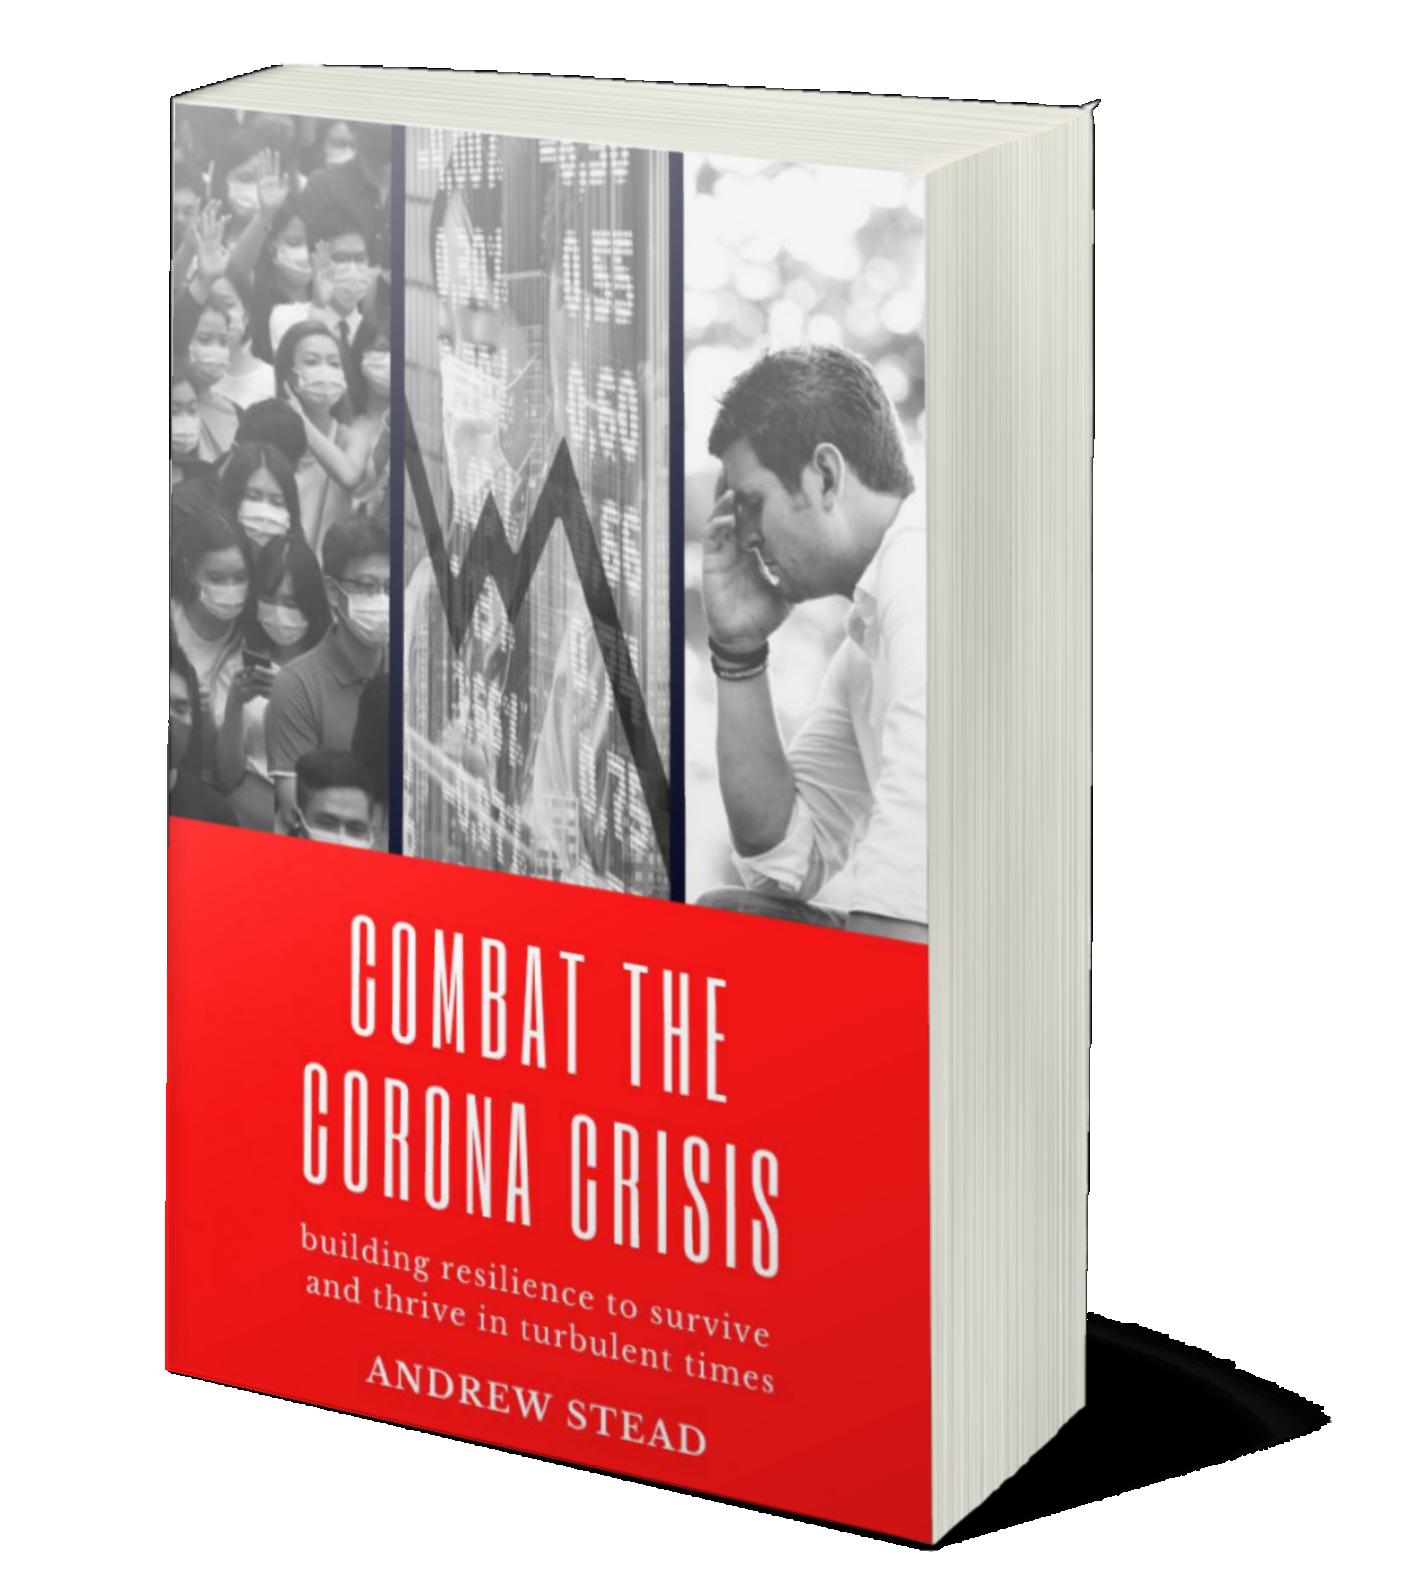 Andrew-Stead-Leadership-Transformation-Combat-Corona-Crisis-Free-Ebook